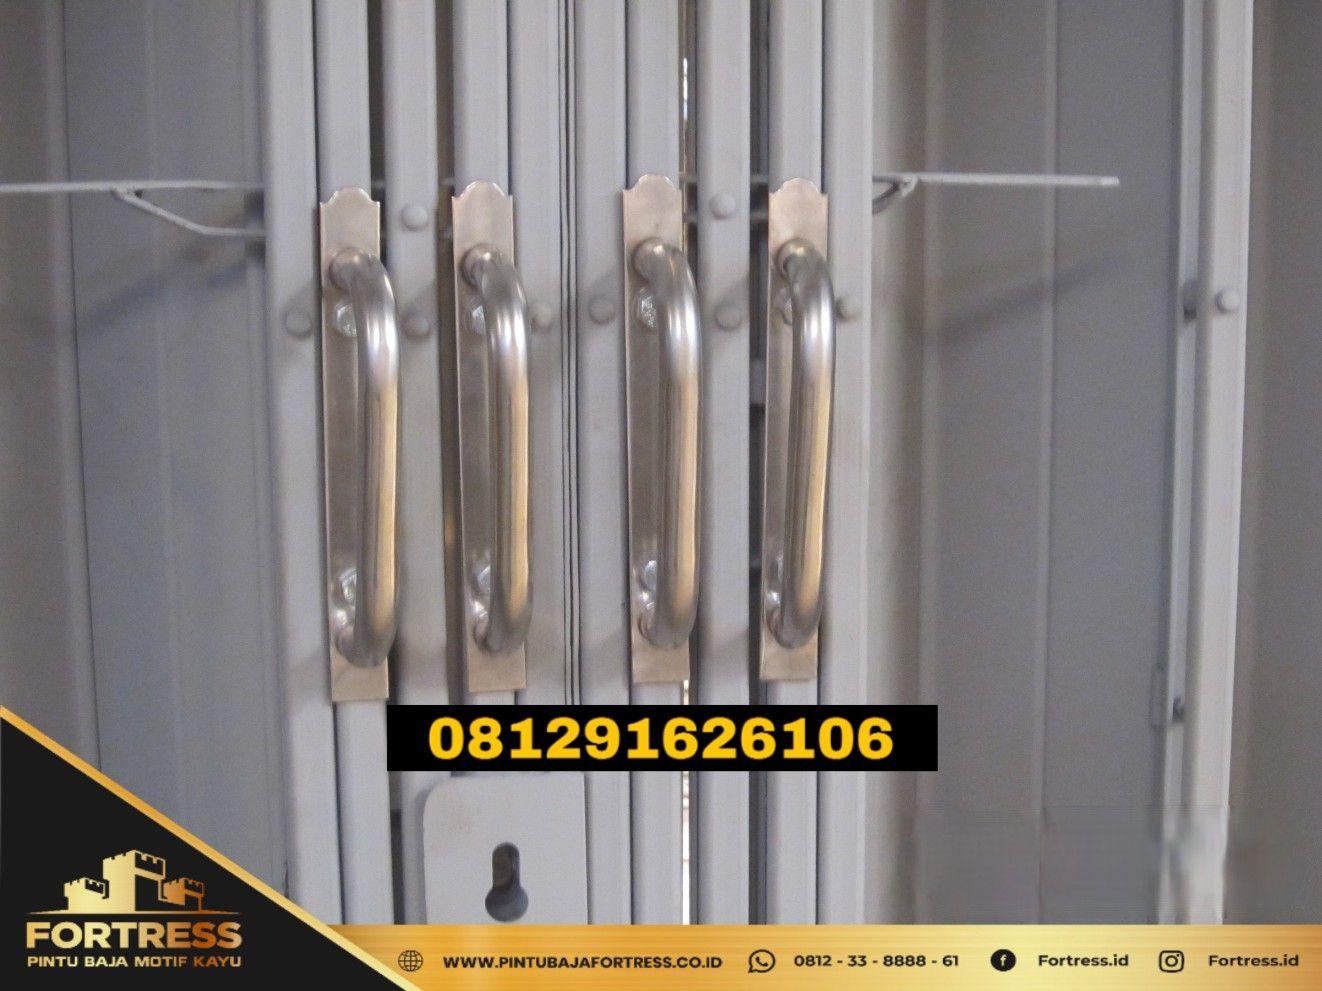 0812-3388-8861 (FORTRESS), Selling Folding Gate In Semarang Ja …